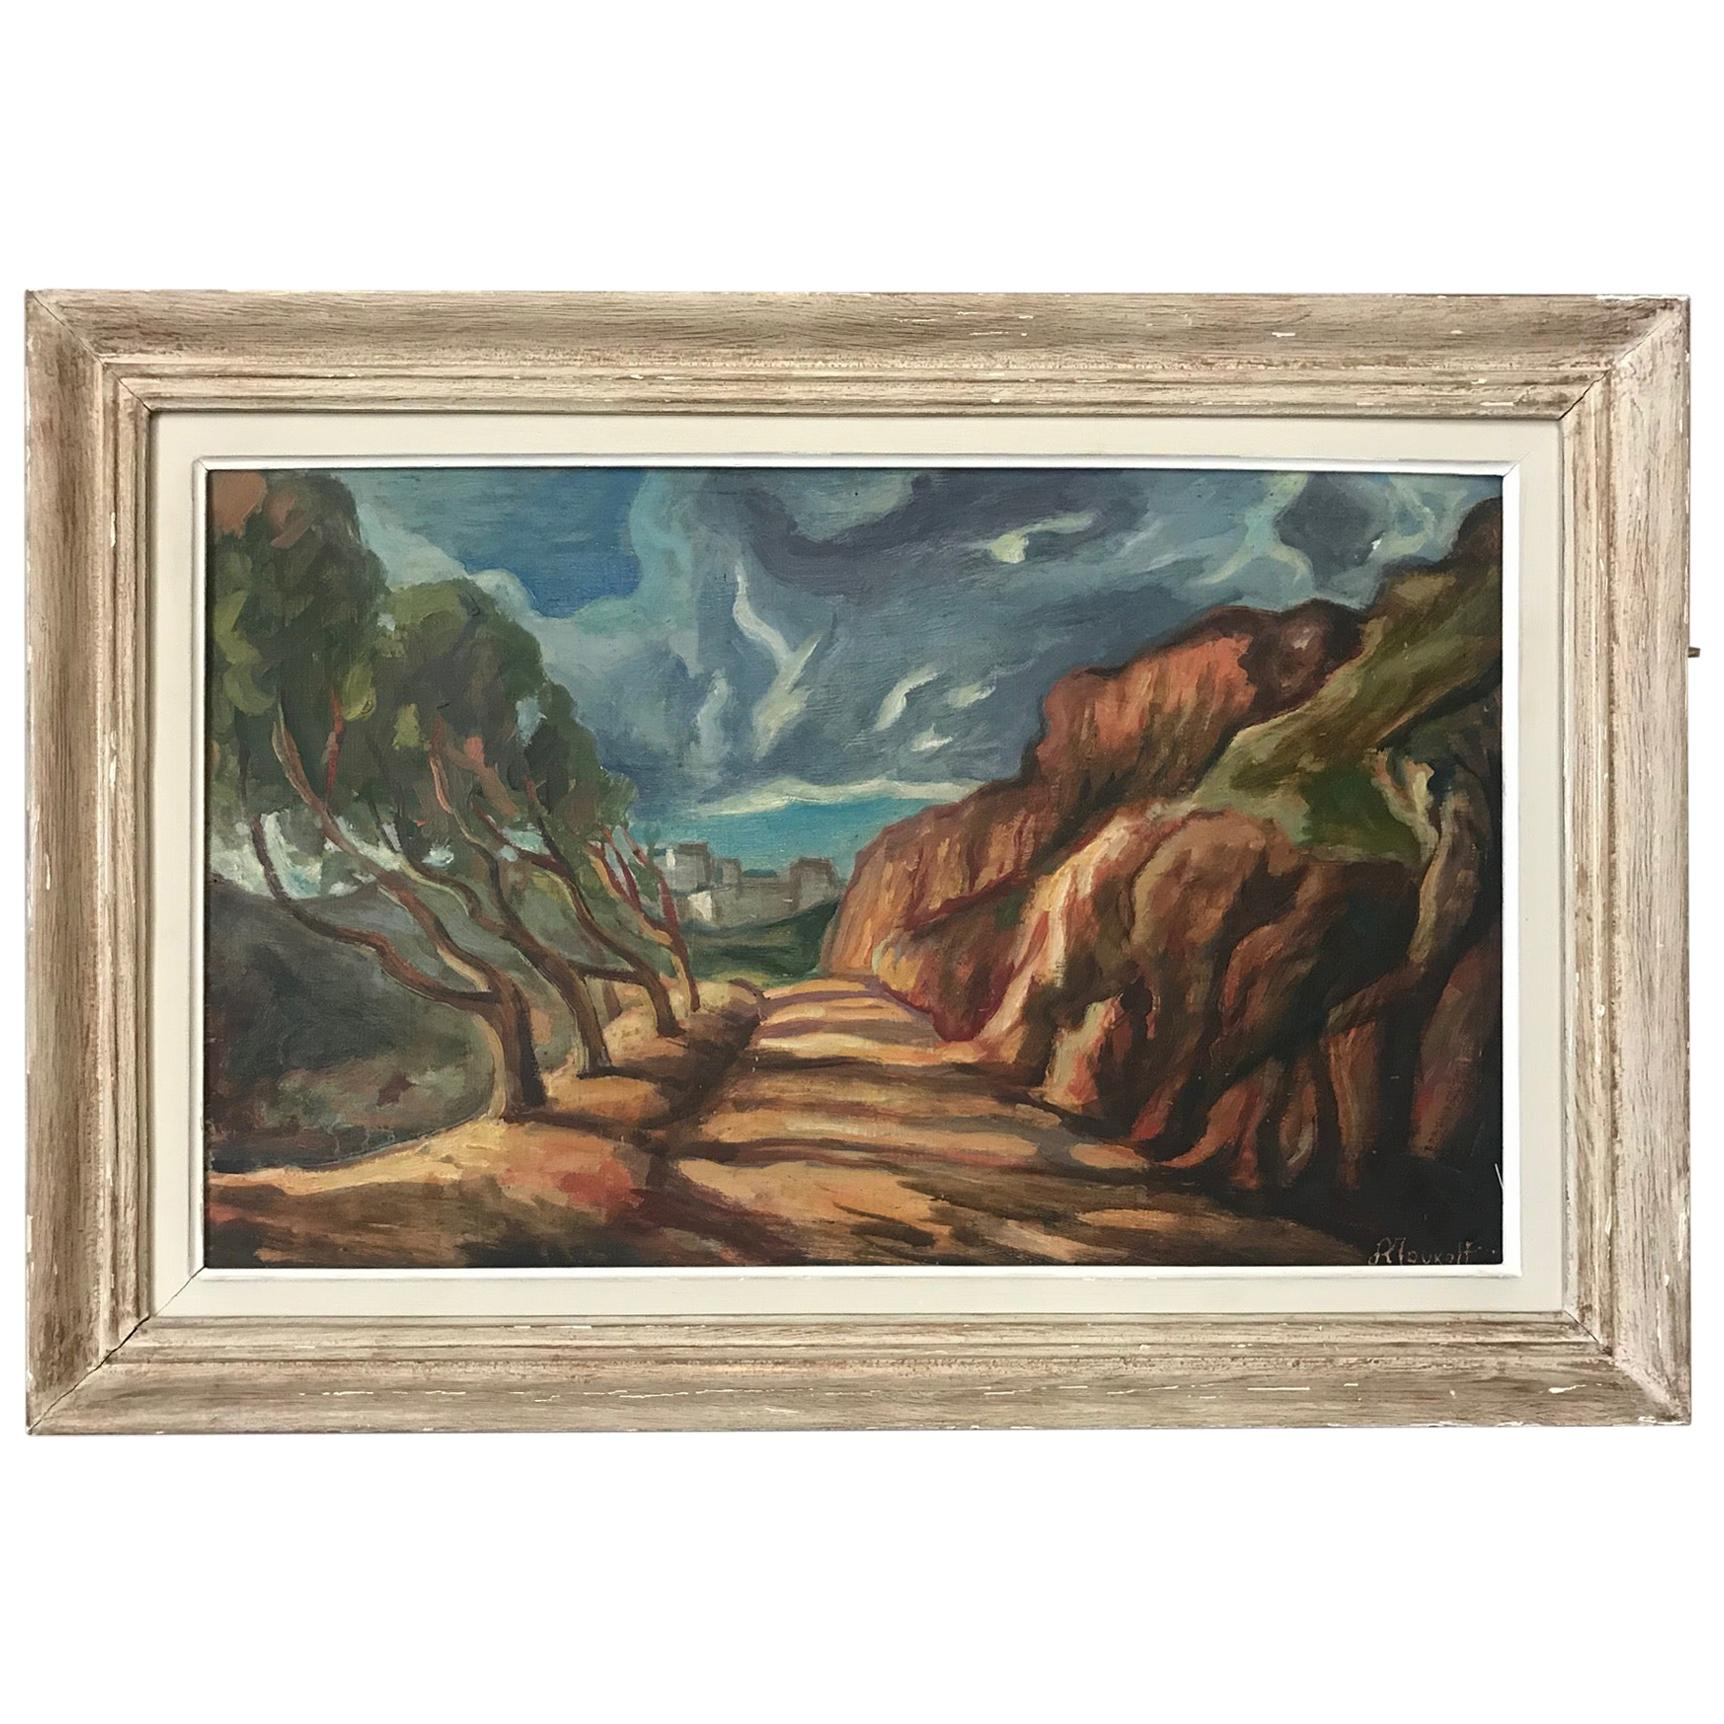 20th Century Seaside Landscape Painting, 1940s